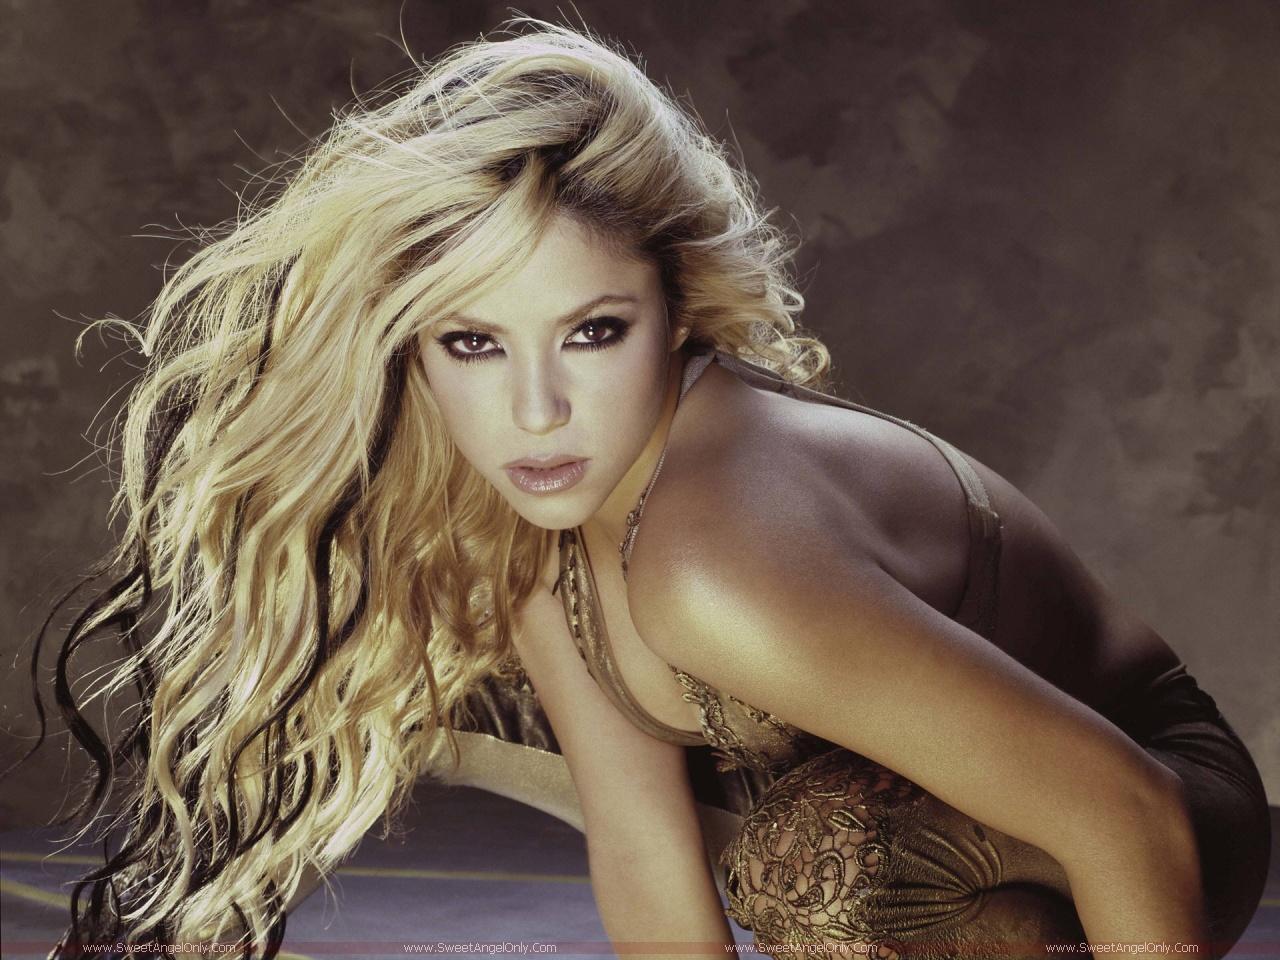 Shakira-HD Pictures, Shakira PhotoShoot - Celebrity Woman ...